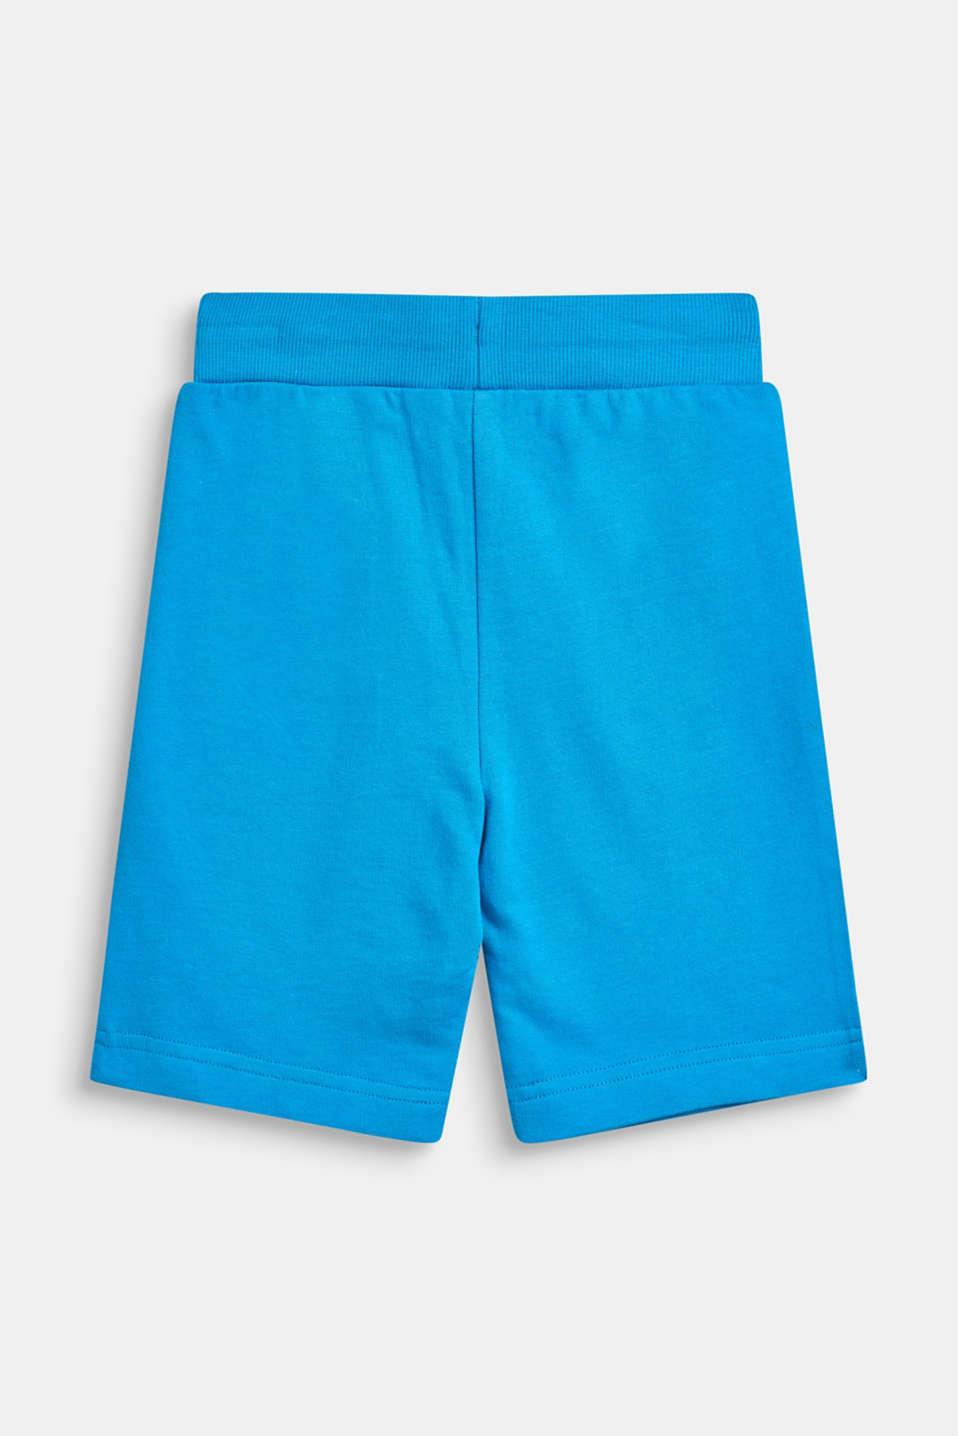 Sweatshirt Bermudas with print, 100% cotton, BRIGHT BLUE, detail image number 1